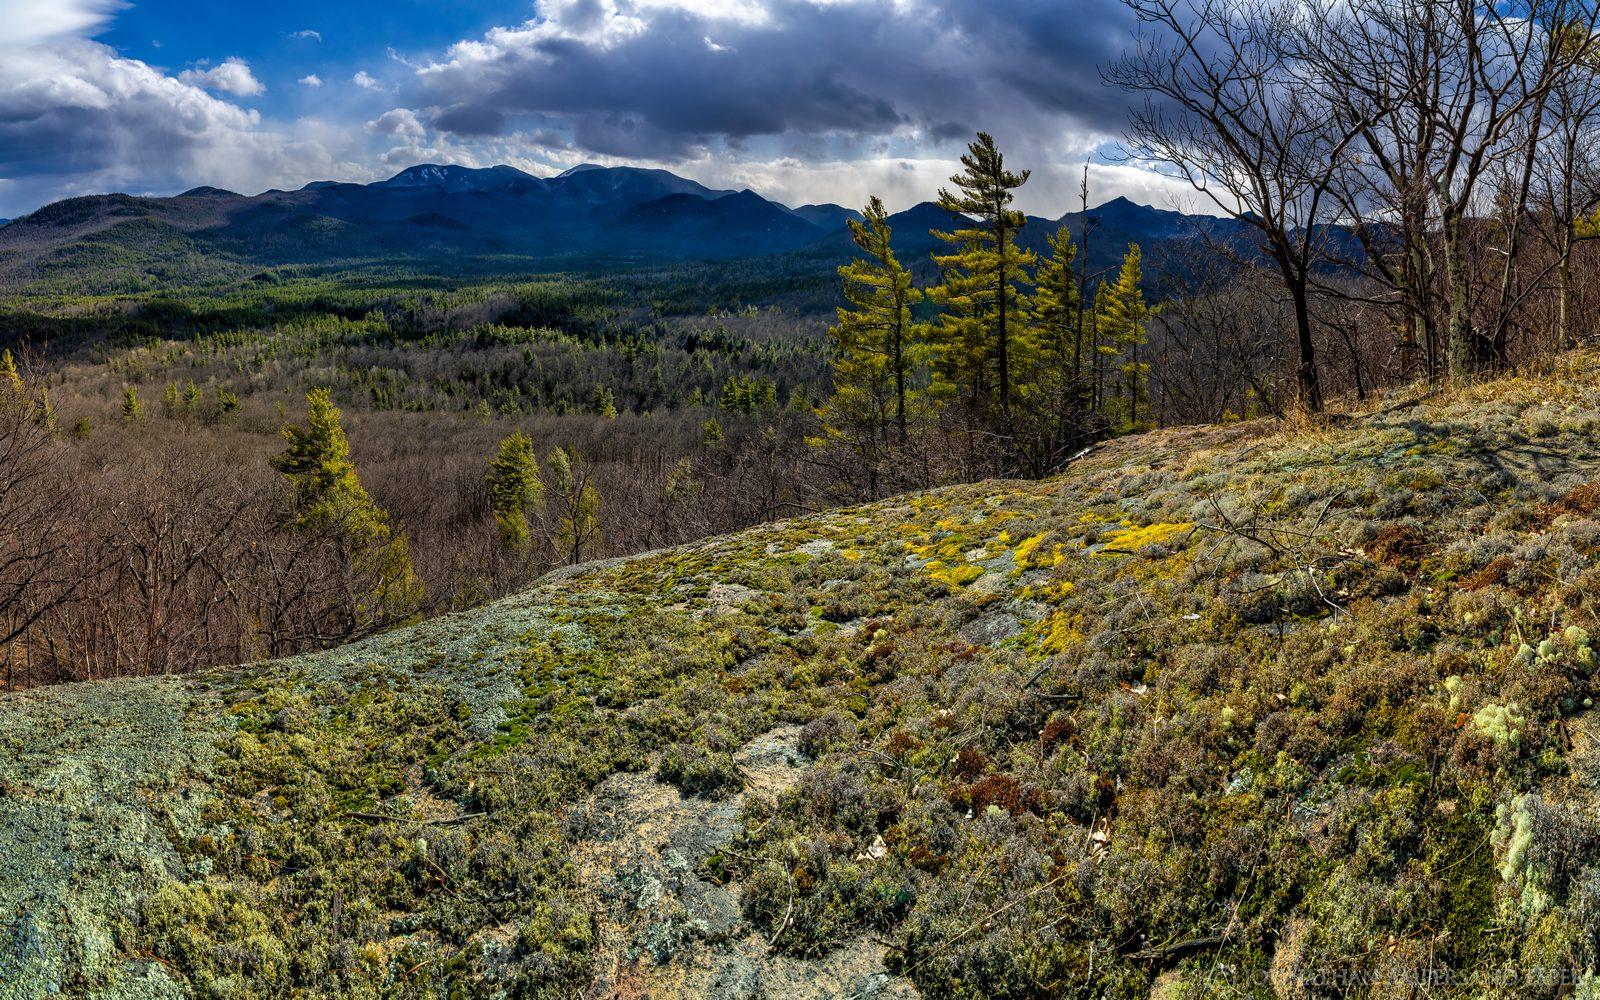 Blueberry Hills Trails,Blueberry Hill Trails,Blueberry Hill trail,Elizabethtown,Limekiln Mt,ledges,bushwhack,April,2020,Giant and Rocky,Giant Mt,Hurricane Mt,Hurricane,Giant,Rocky,Rocky Peak Ridge,lic, photo